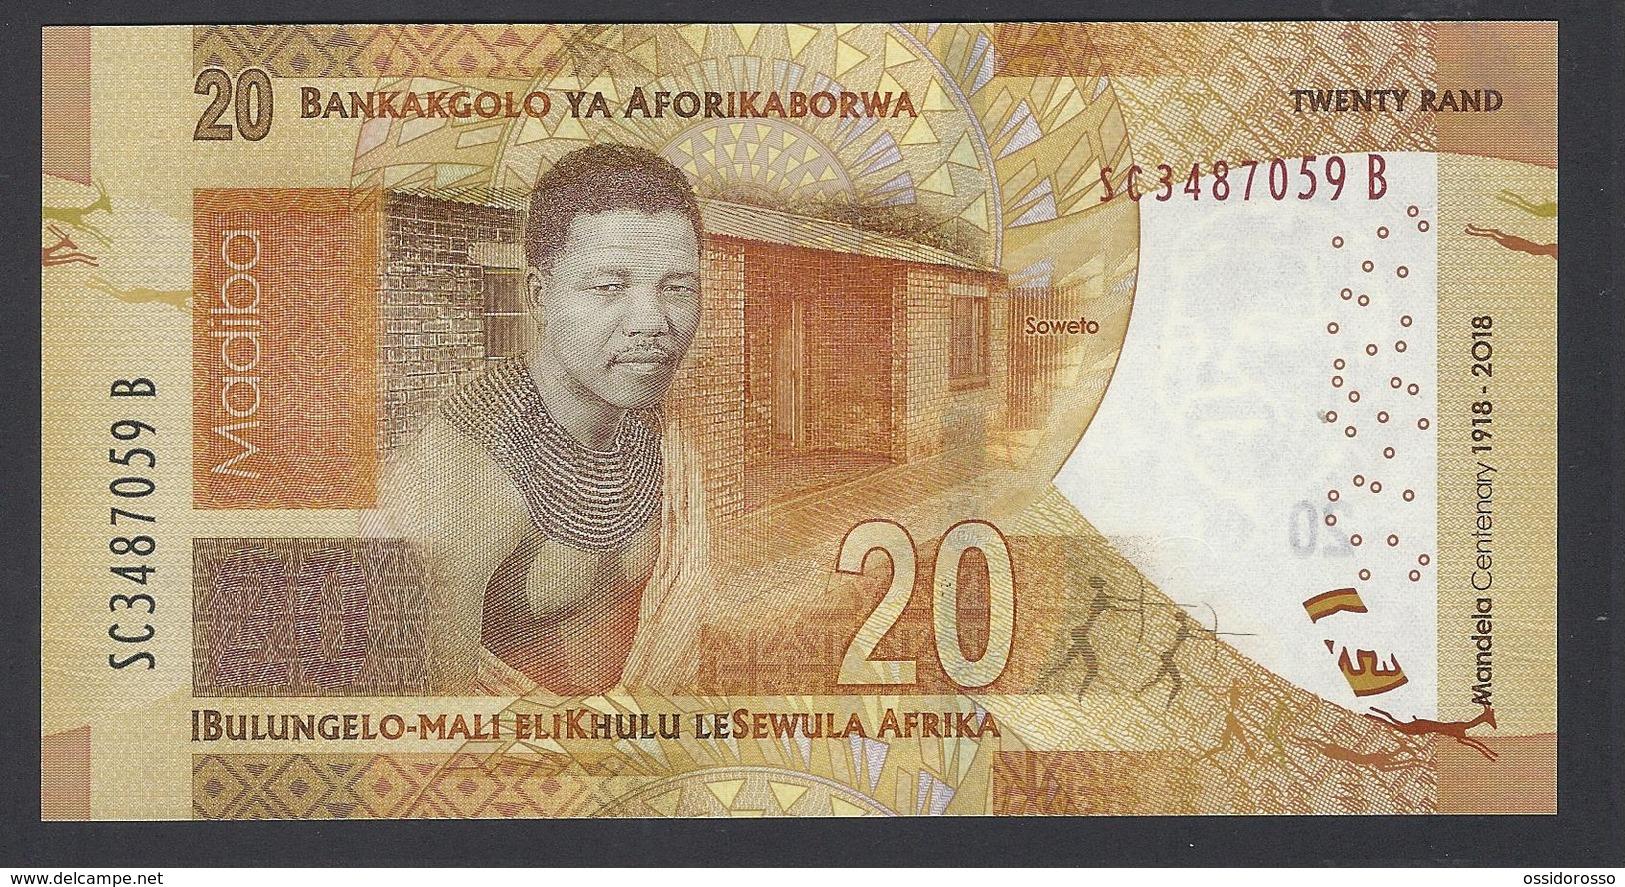 South Africa - 20 Rand - Mandela Centenary 1918-2018 - SC 3487059 B - MSPL/SPL - Sudafrica